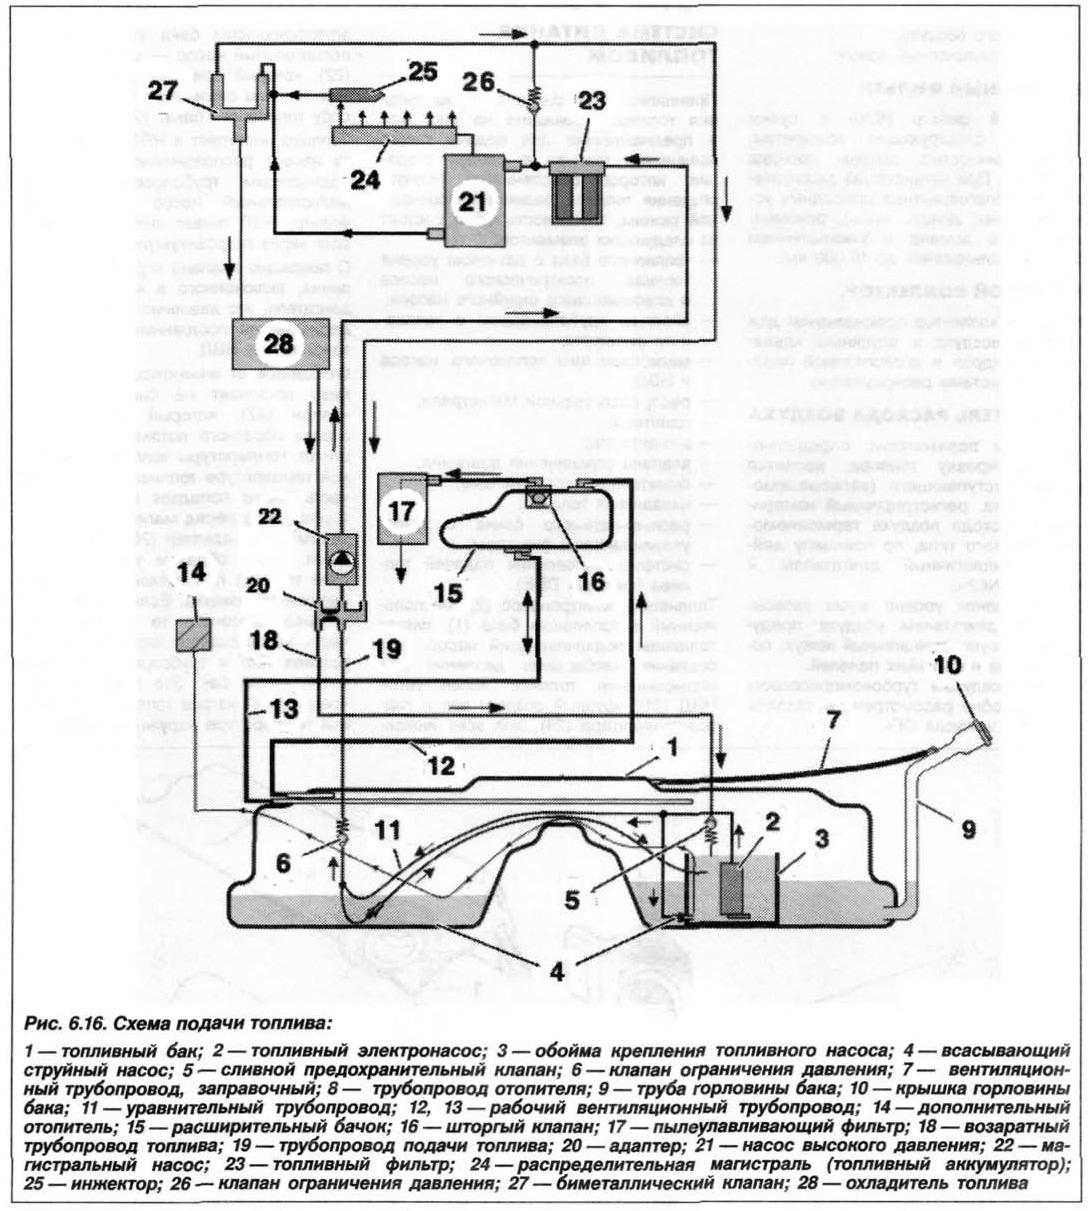 Рис. 6.16. Схема подачи топлива БМВ Х5 Е53